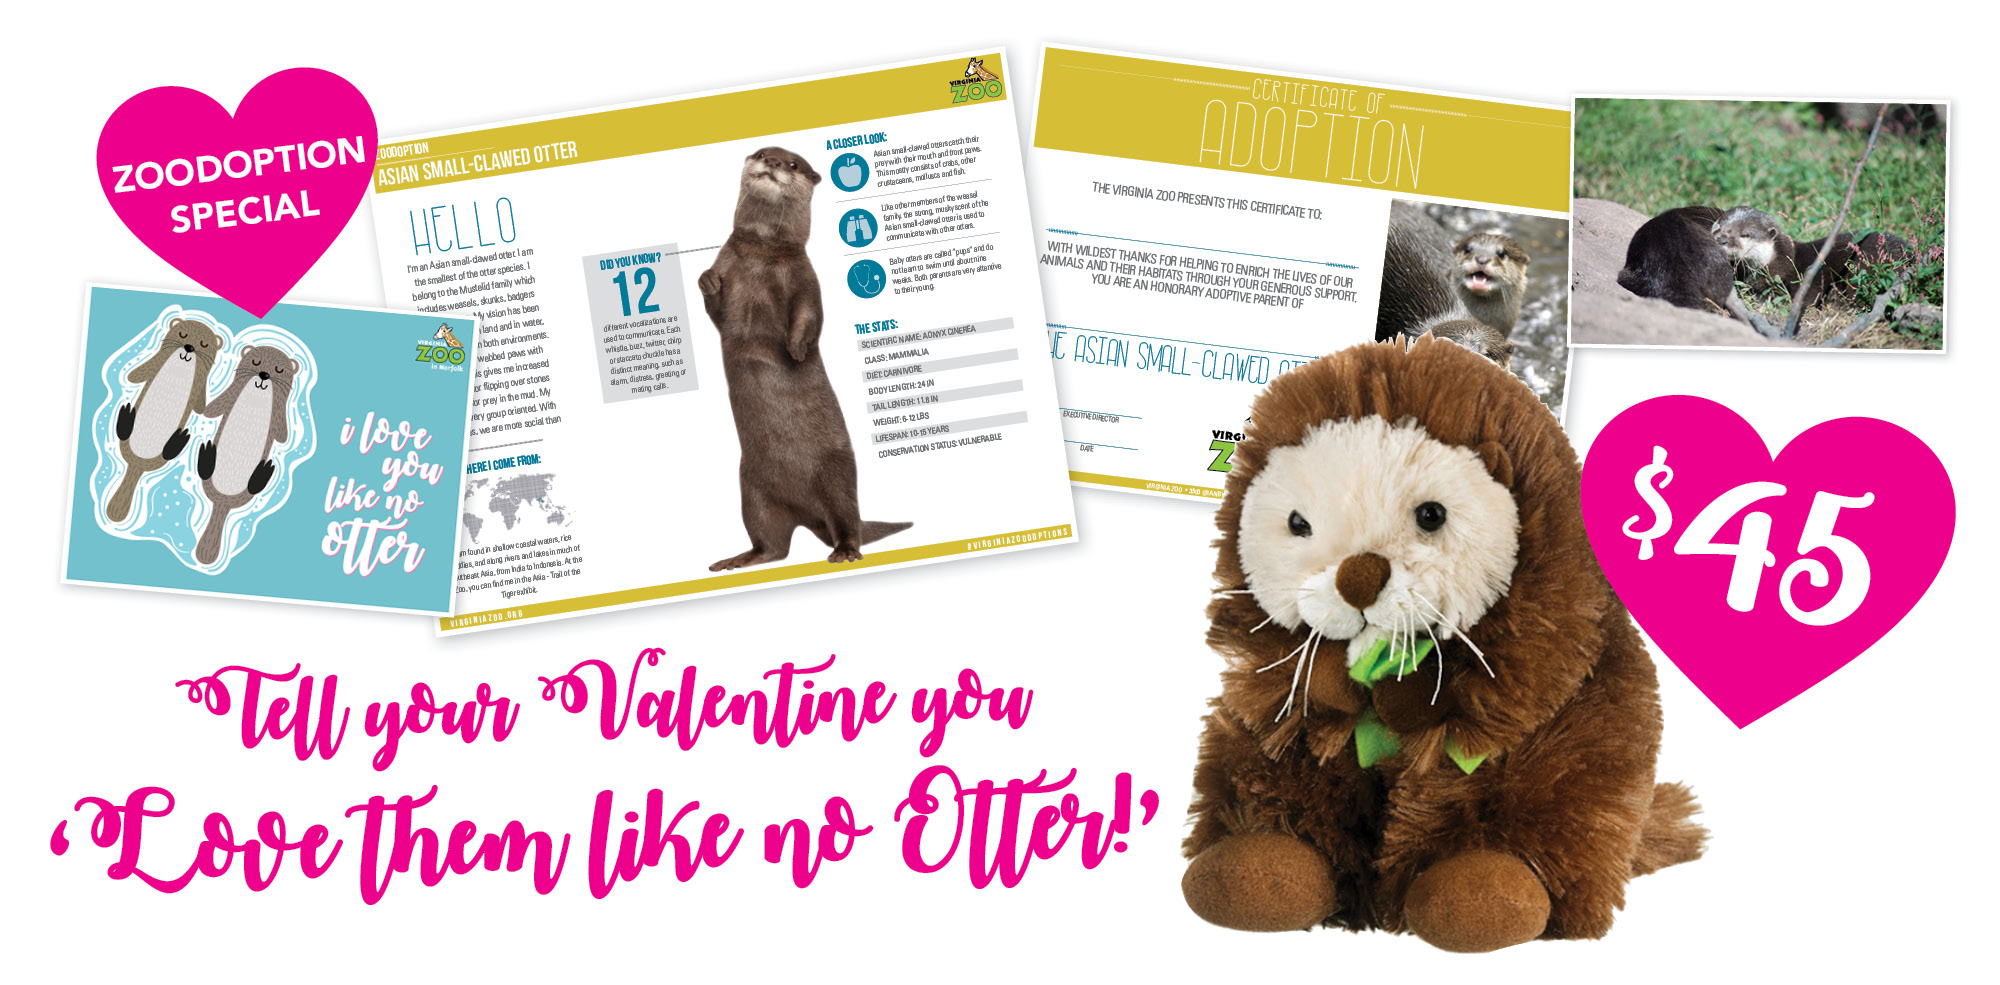 VAZOO_Vday Otter 2018_homepage slider